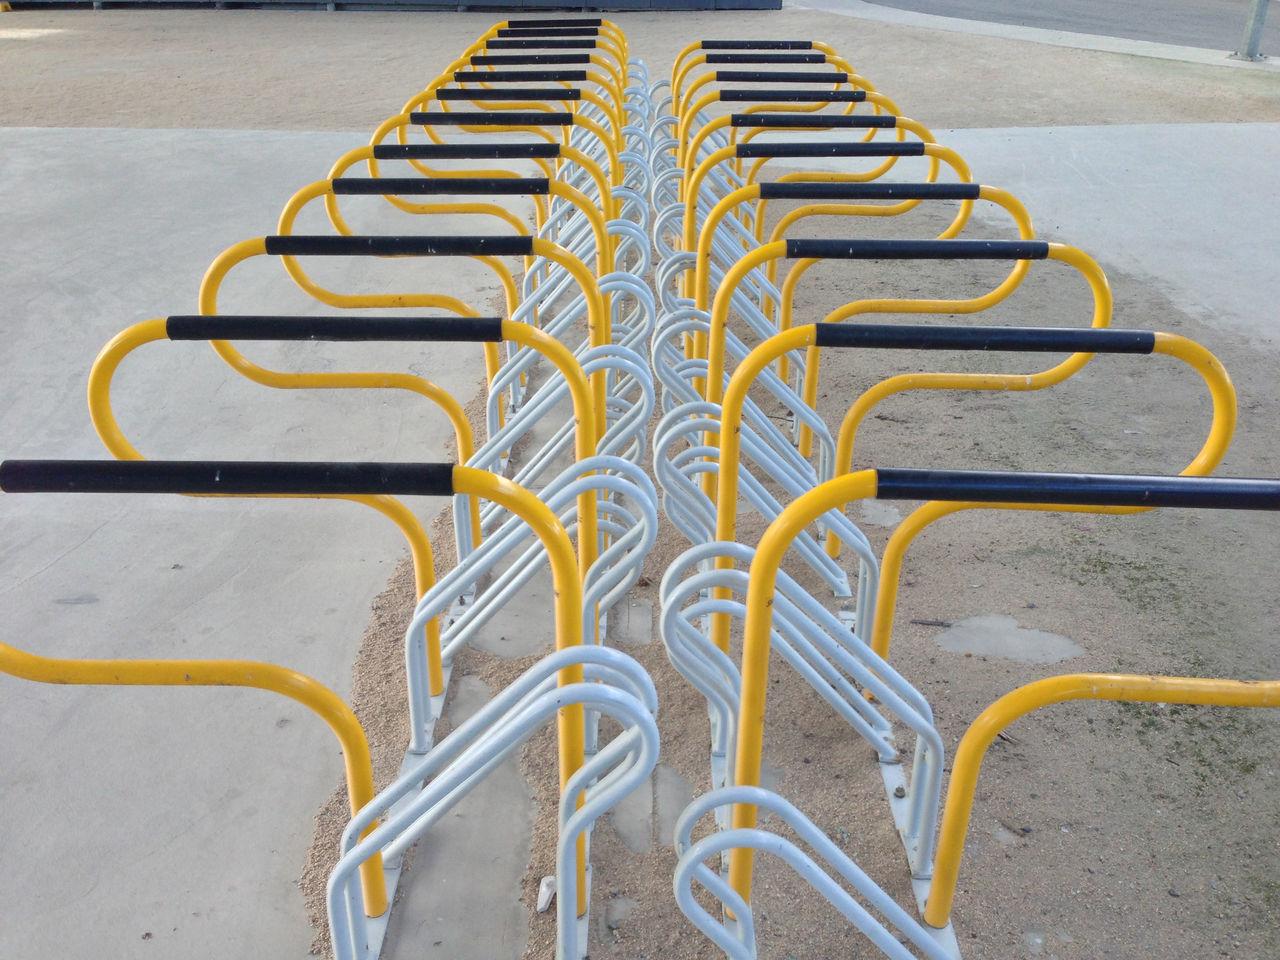 Beautiful stock photos of bike, Barriers, Bicycle, Bicycle Racks, Bike